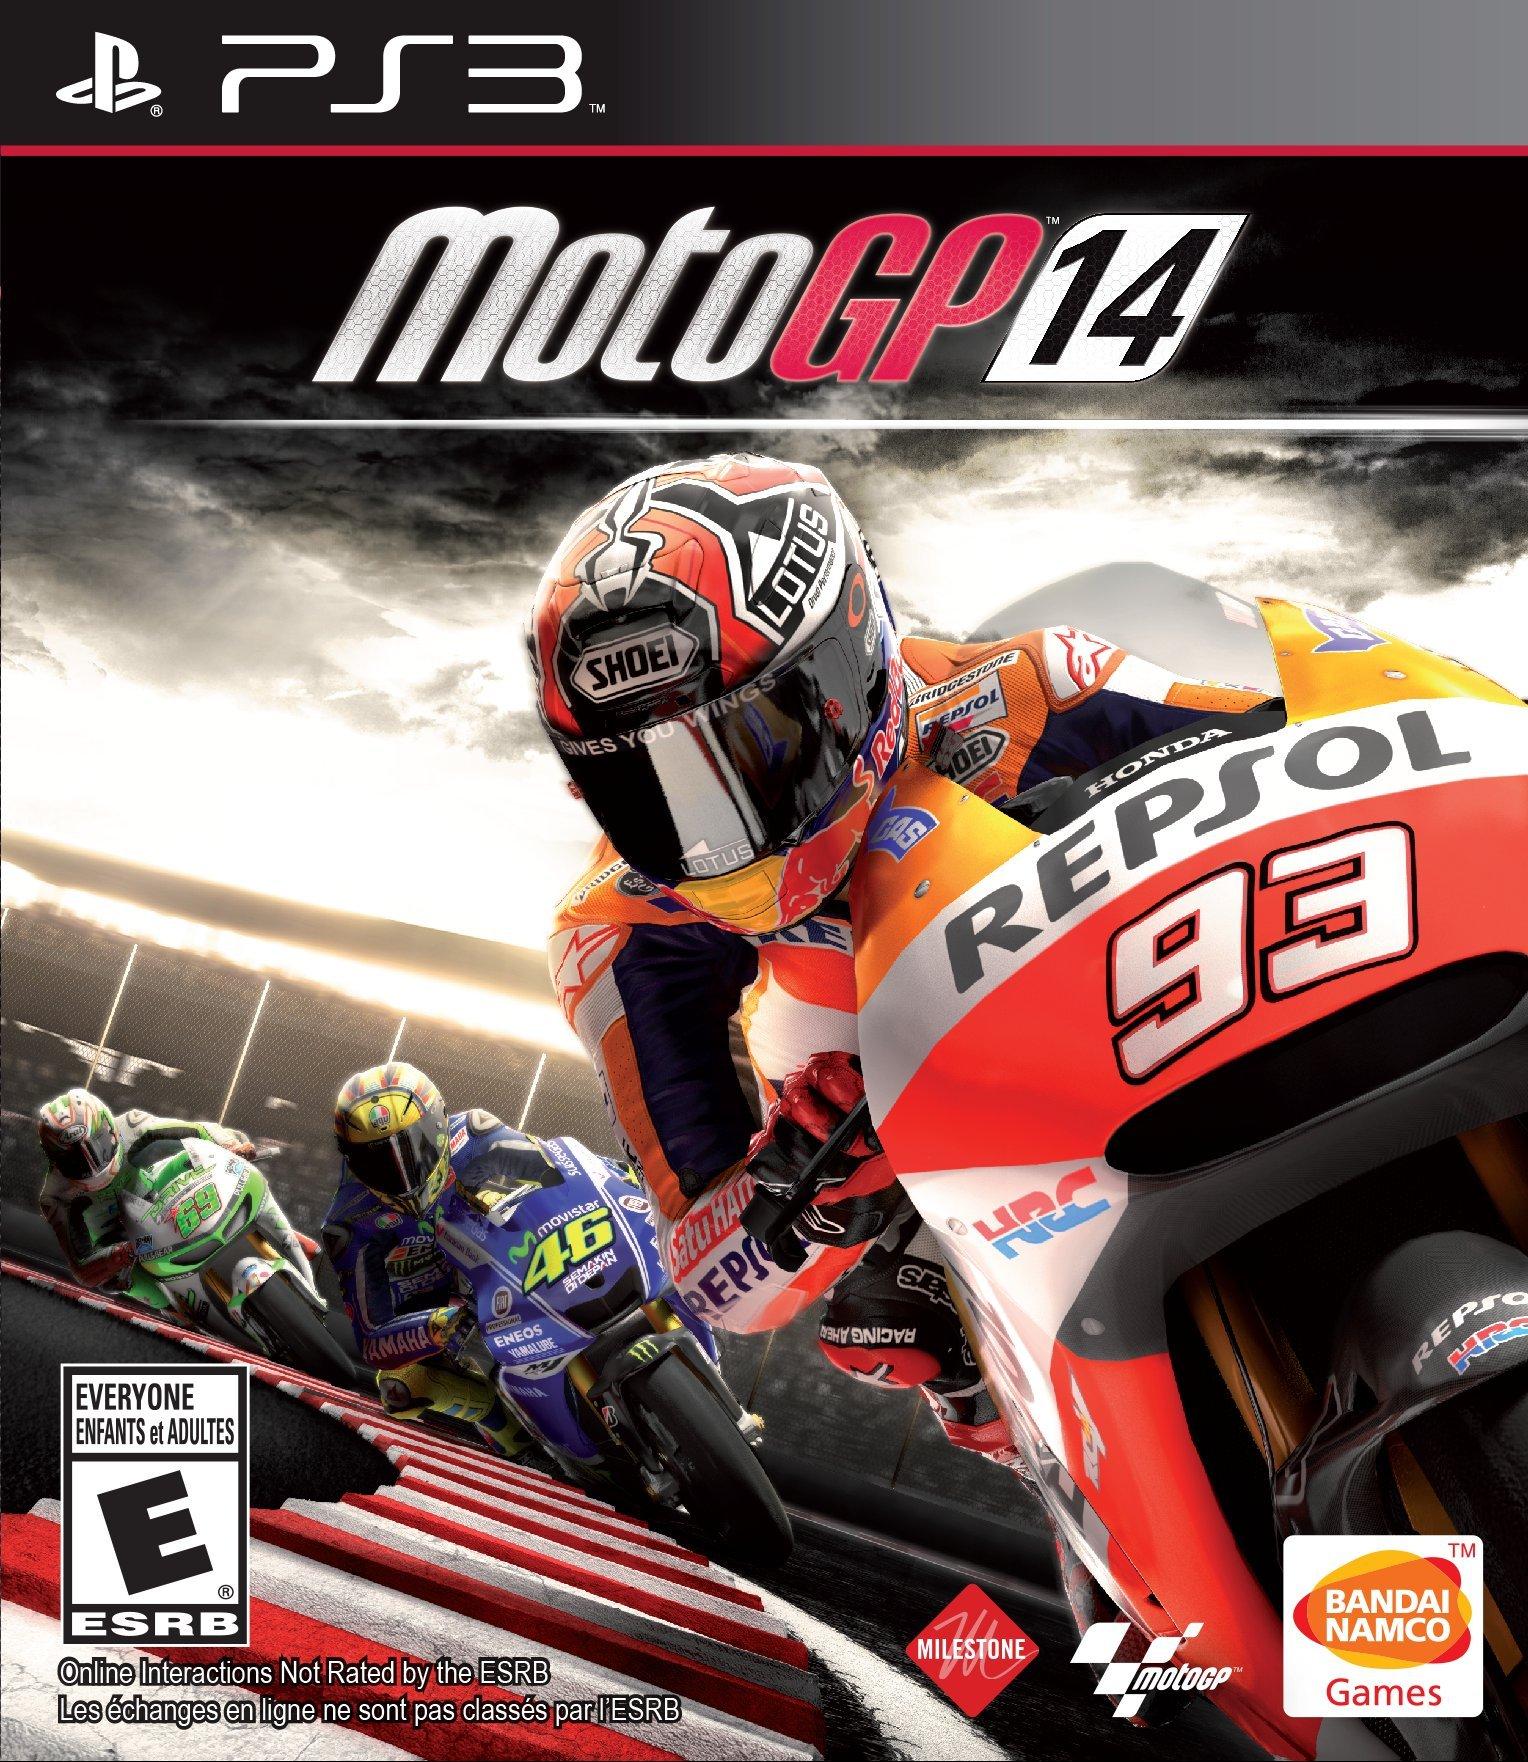 Moto GP 2014 Release Date (Xbox 360, PS3, PS4)